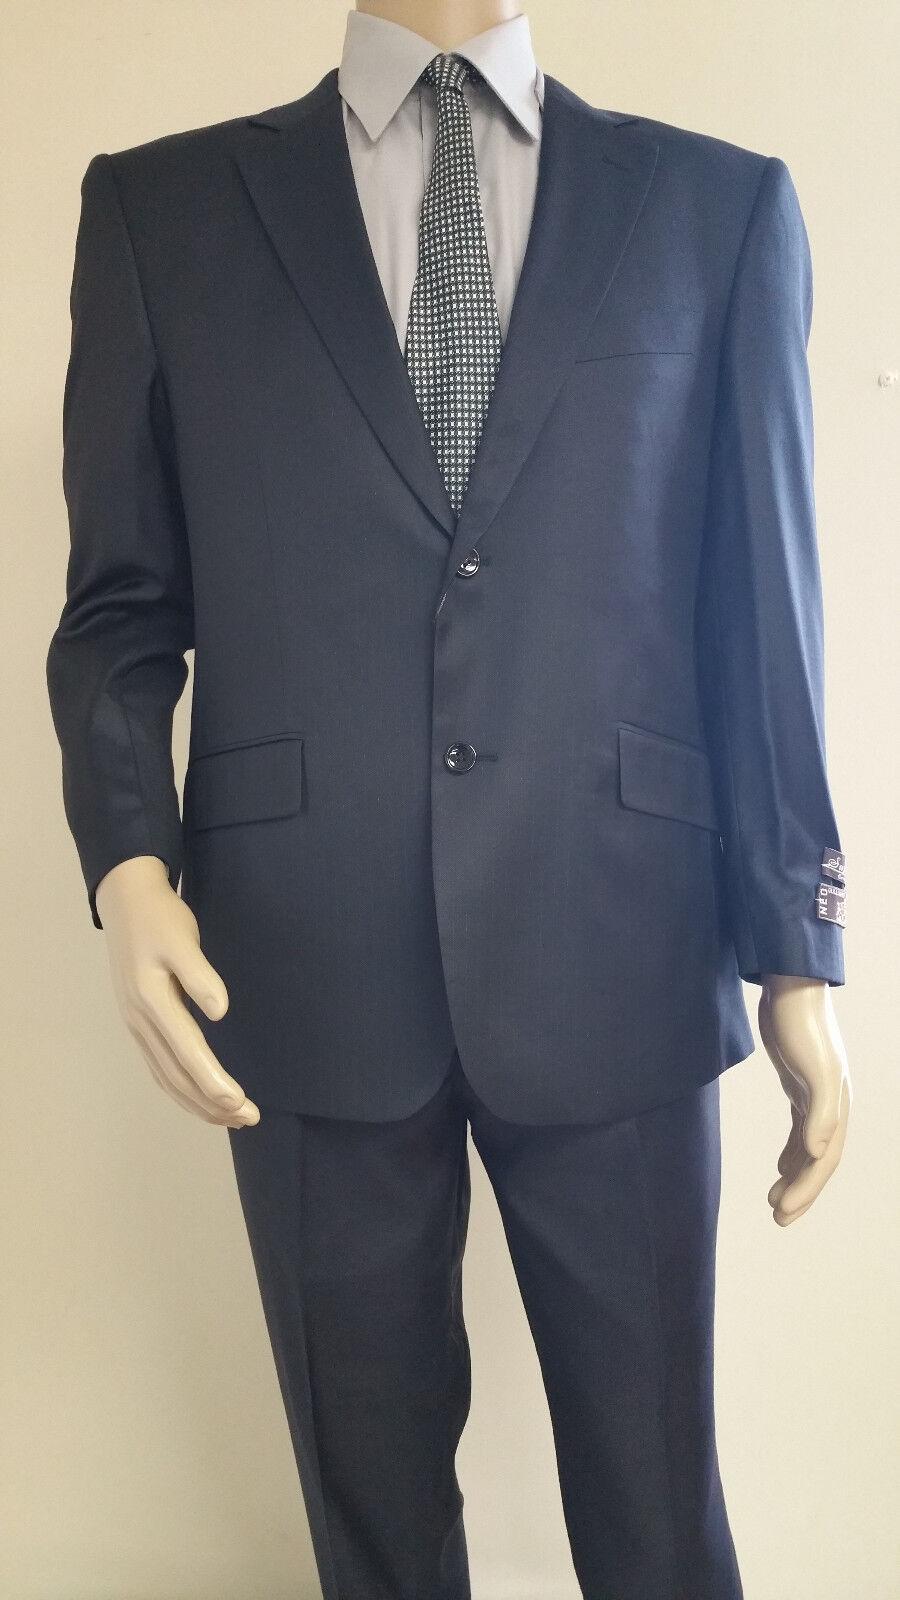 Men's Premium Quality Brown PinStripe Modern Fit Dress Suits Brand New Suit 46 R